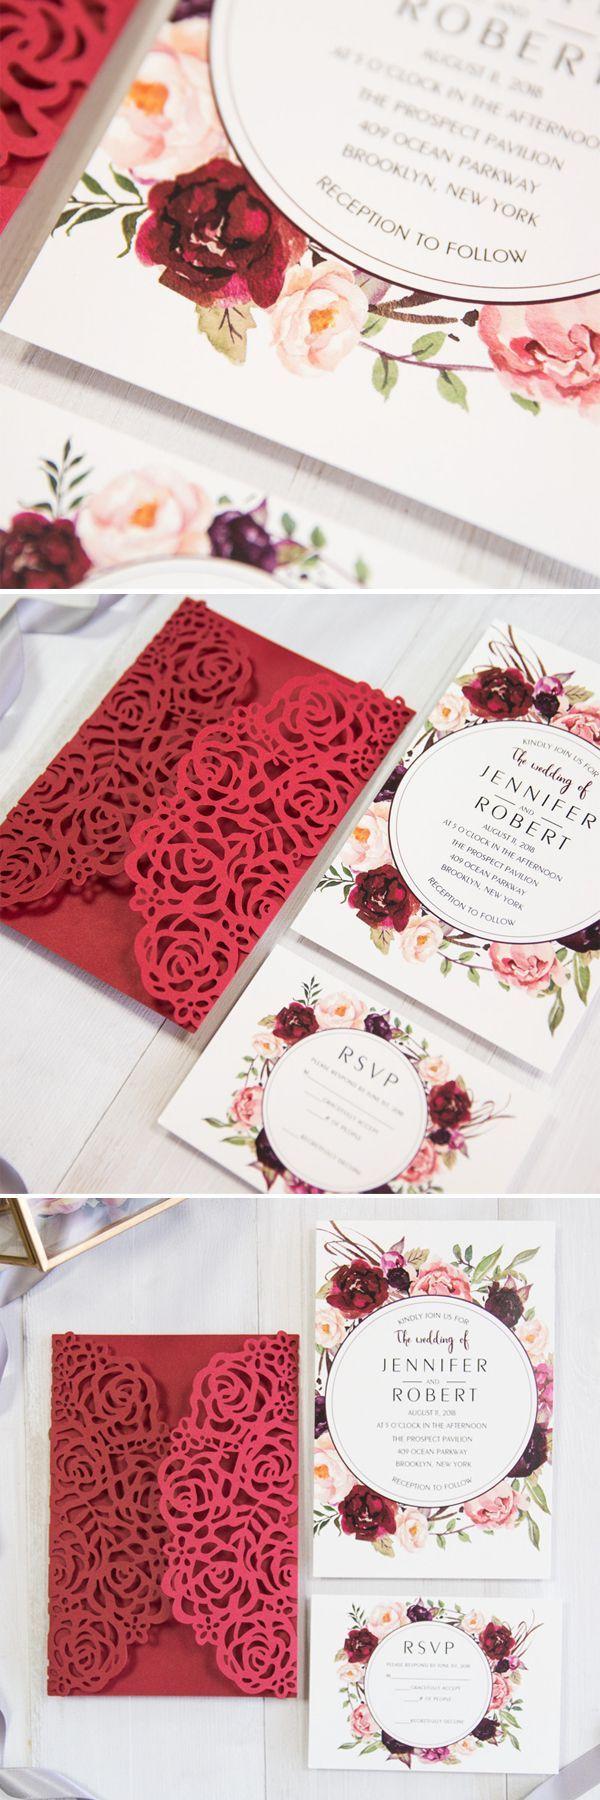 186 best Wedding Invitation Inspiration images on Pinterest ...